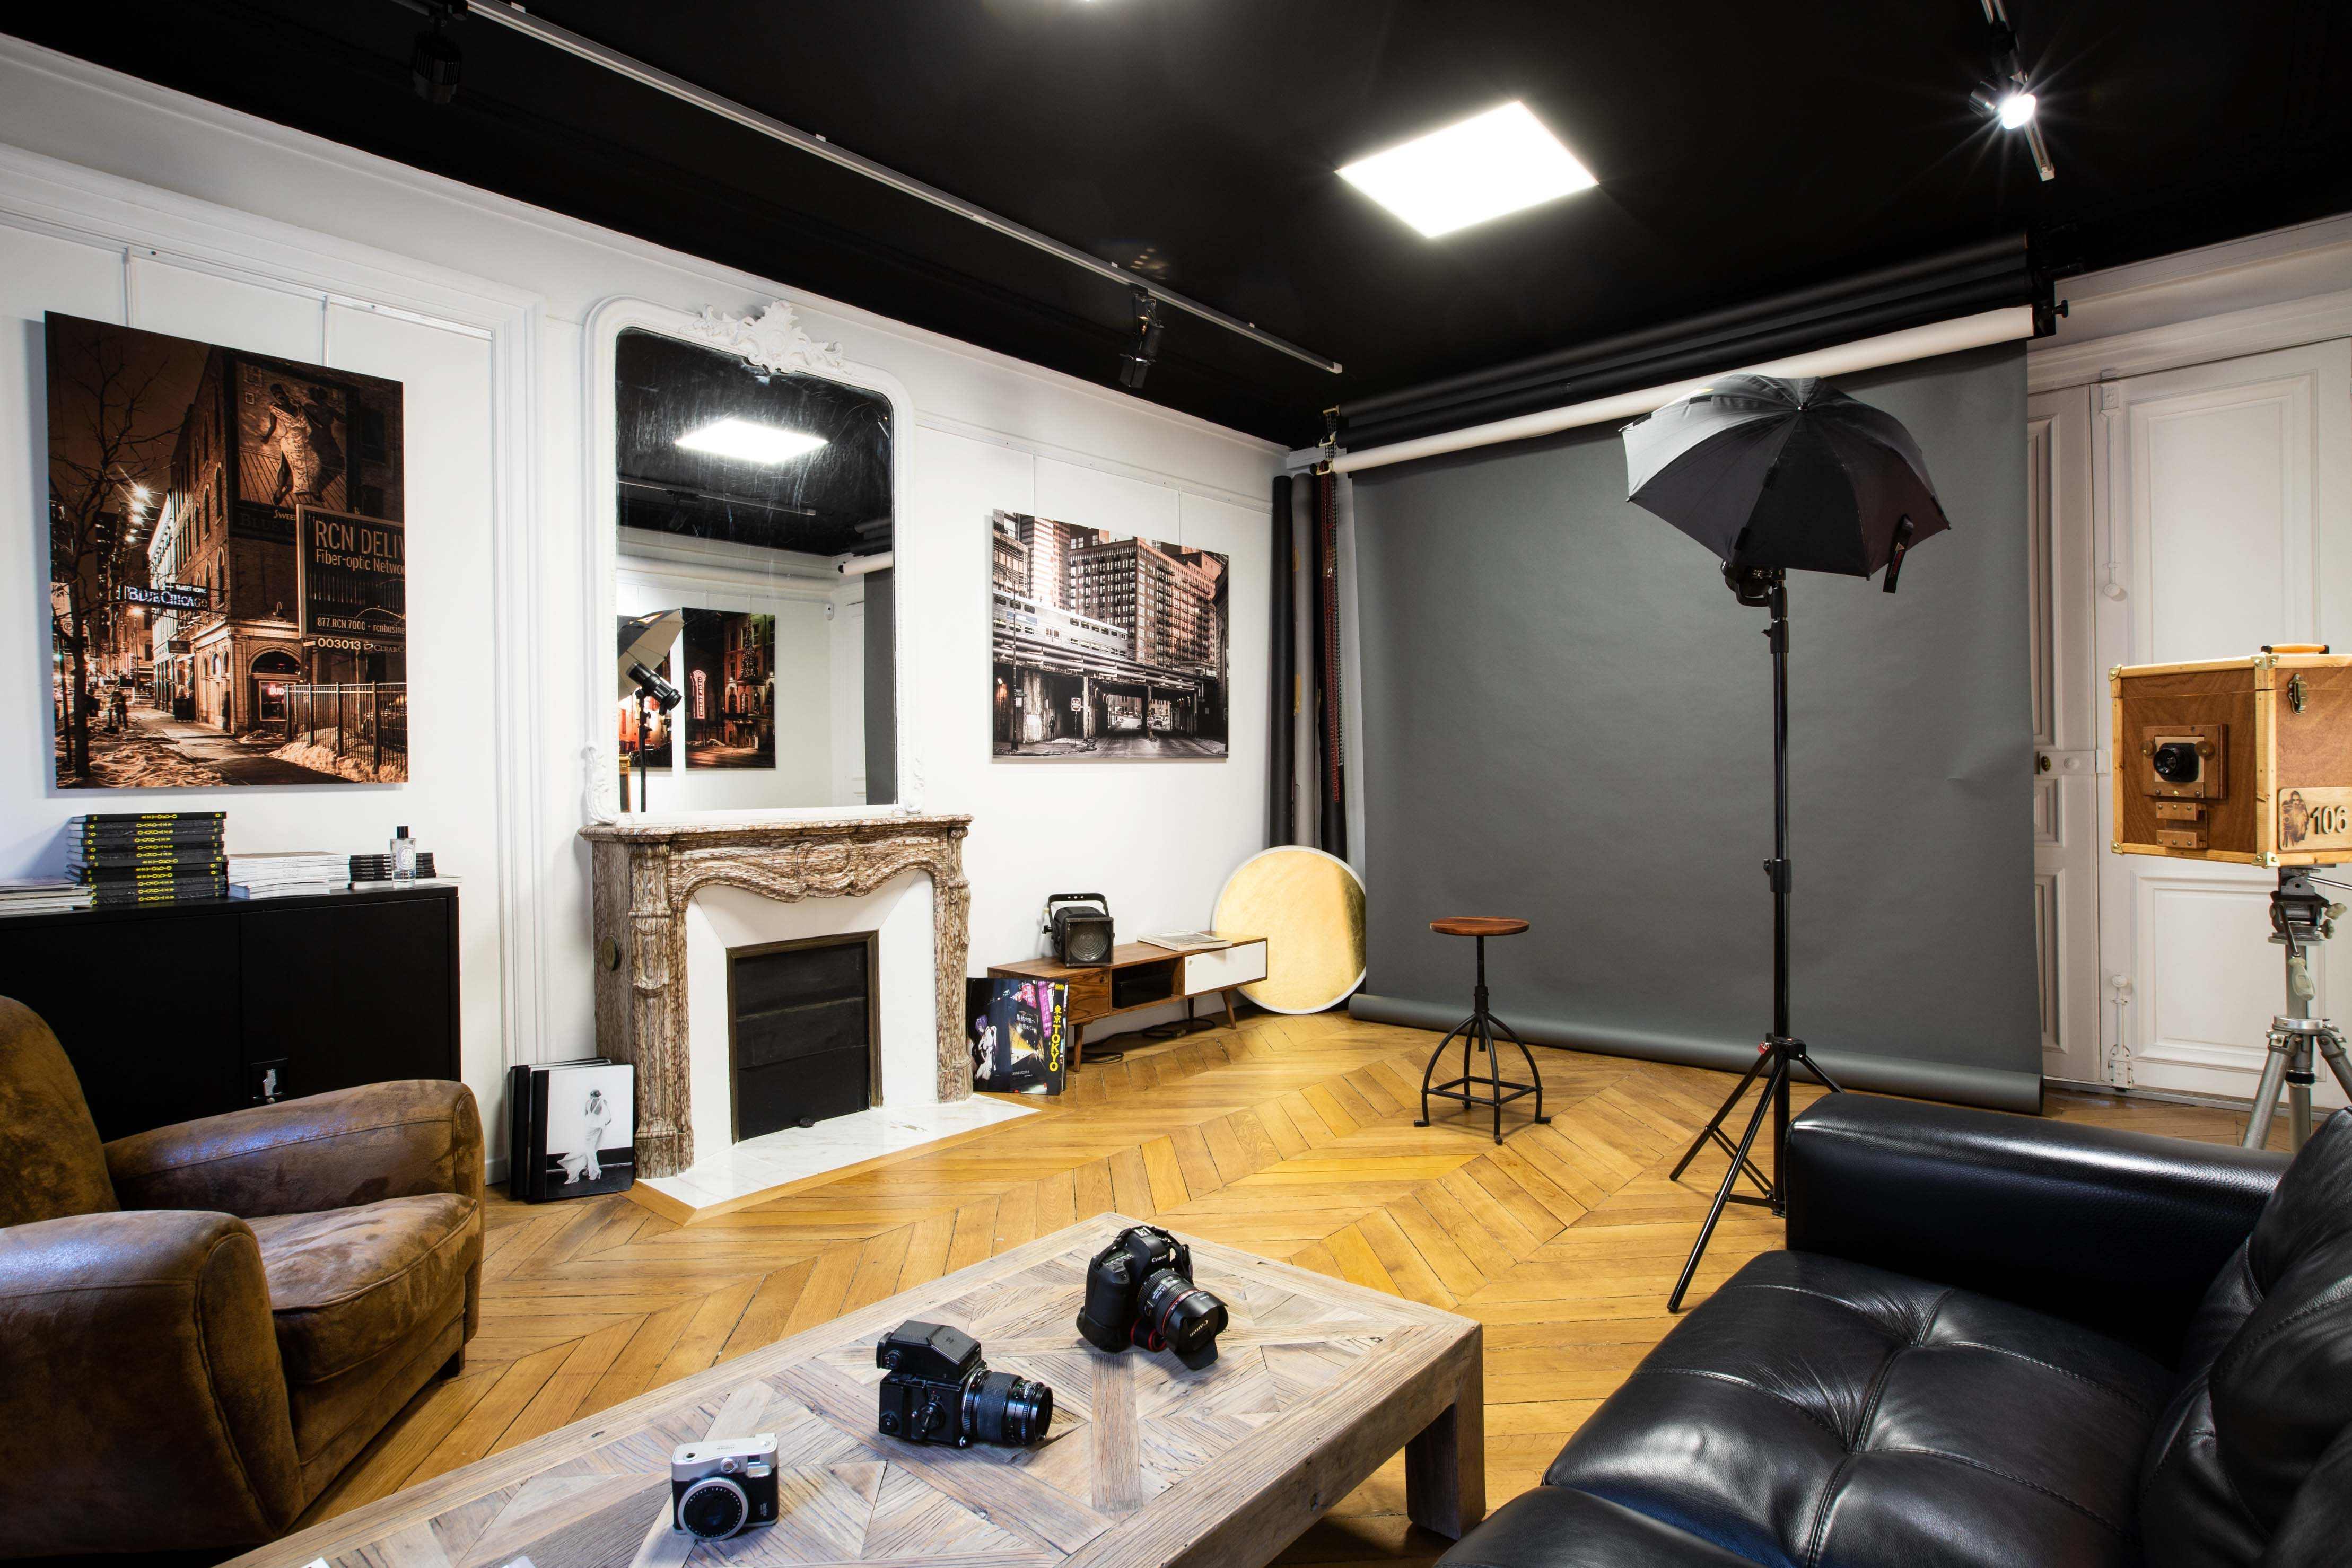 Studio Alterego